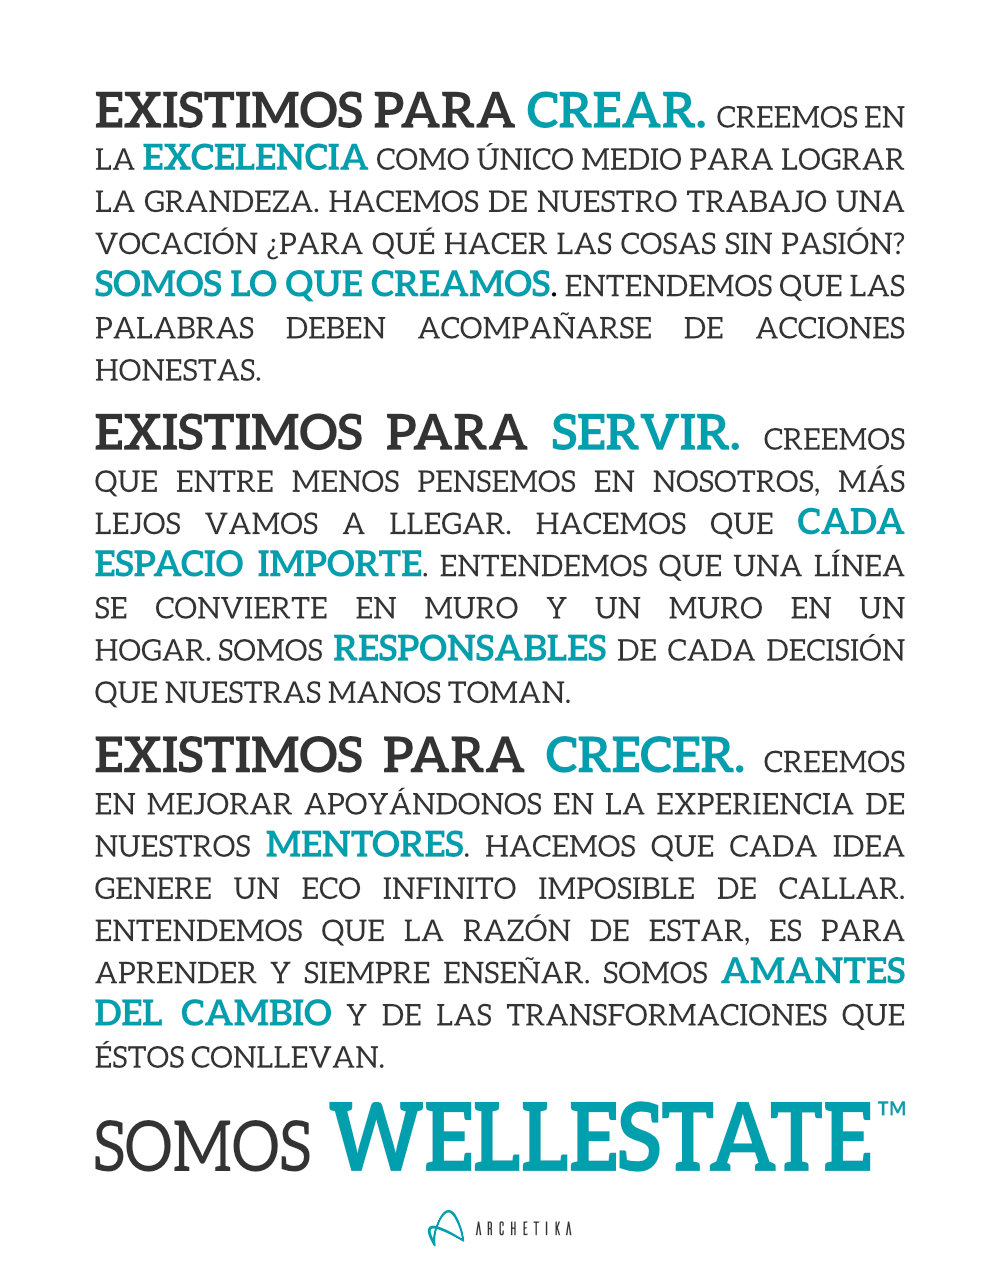 Wellestate™ Manifesto - © Archetika